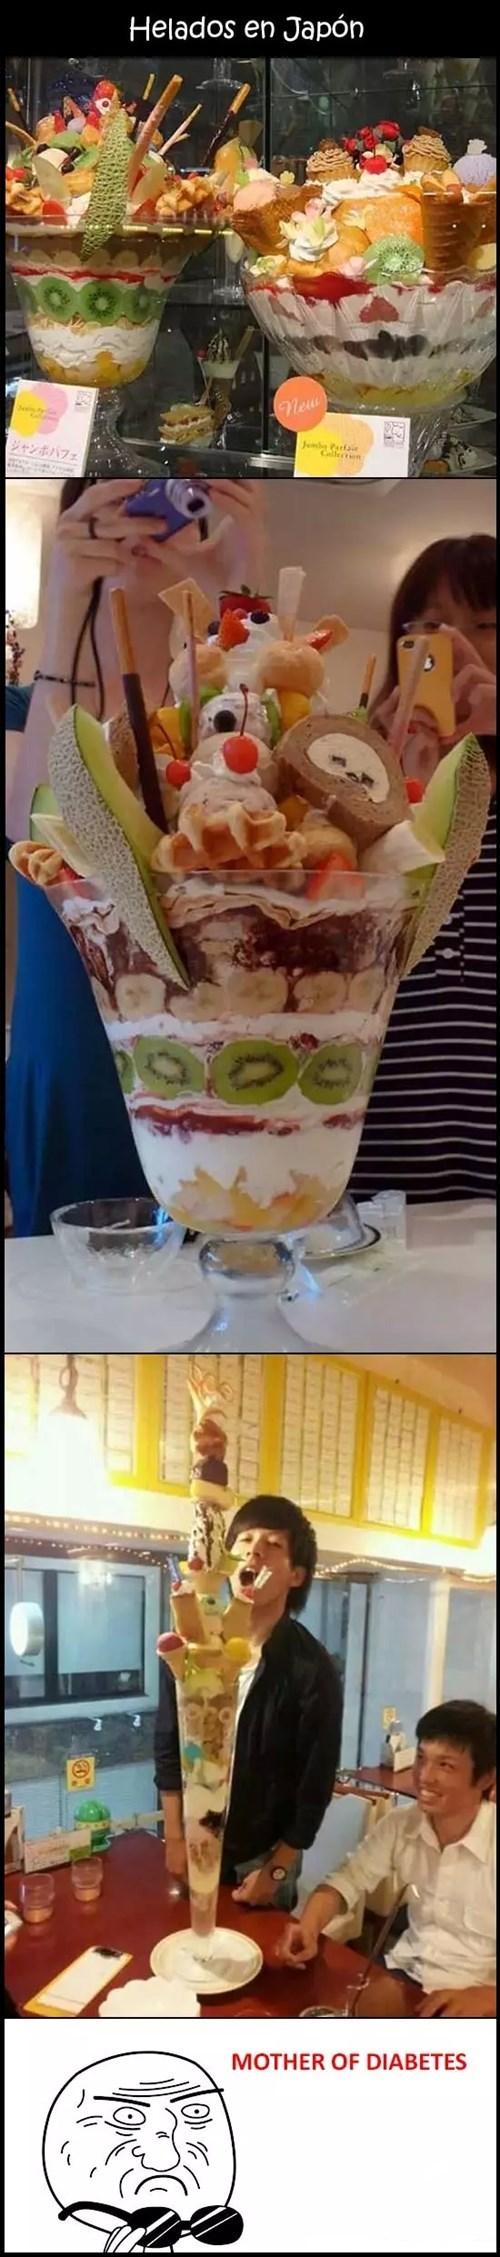 helados japoneses